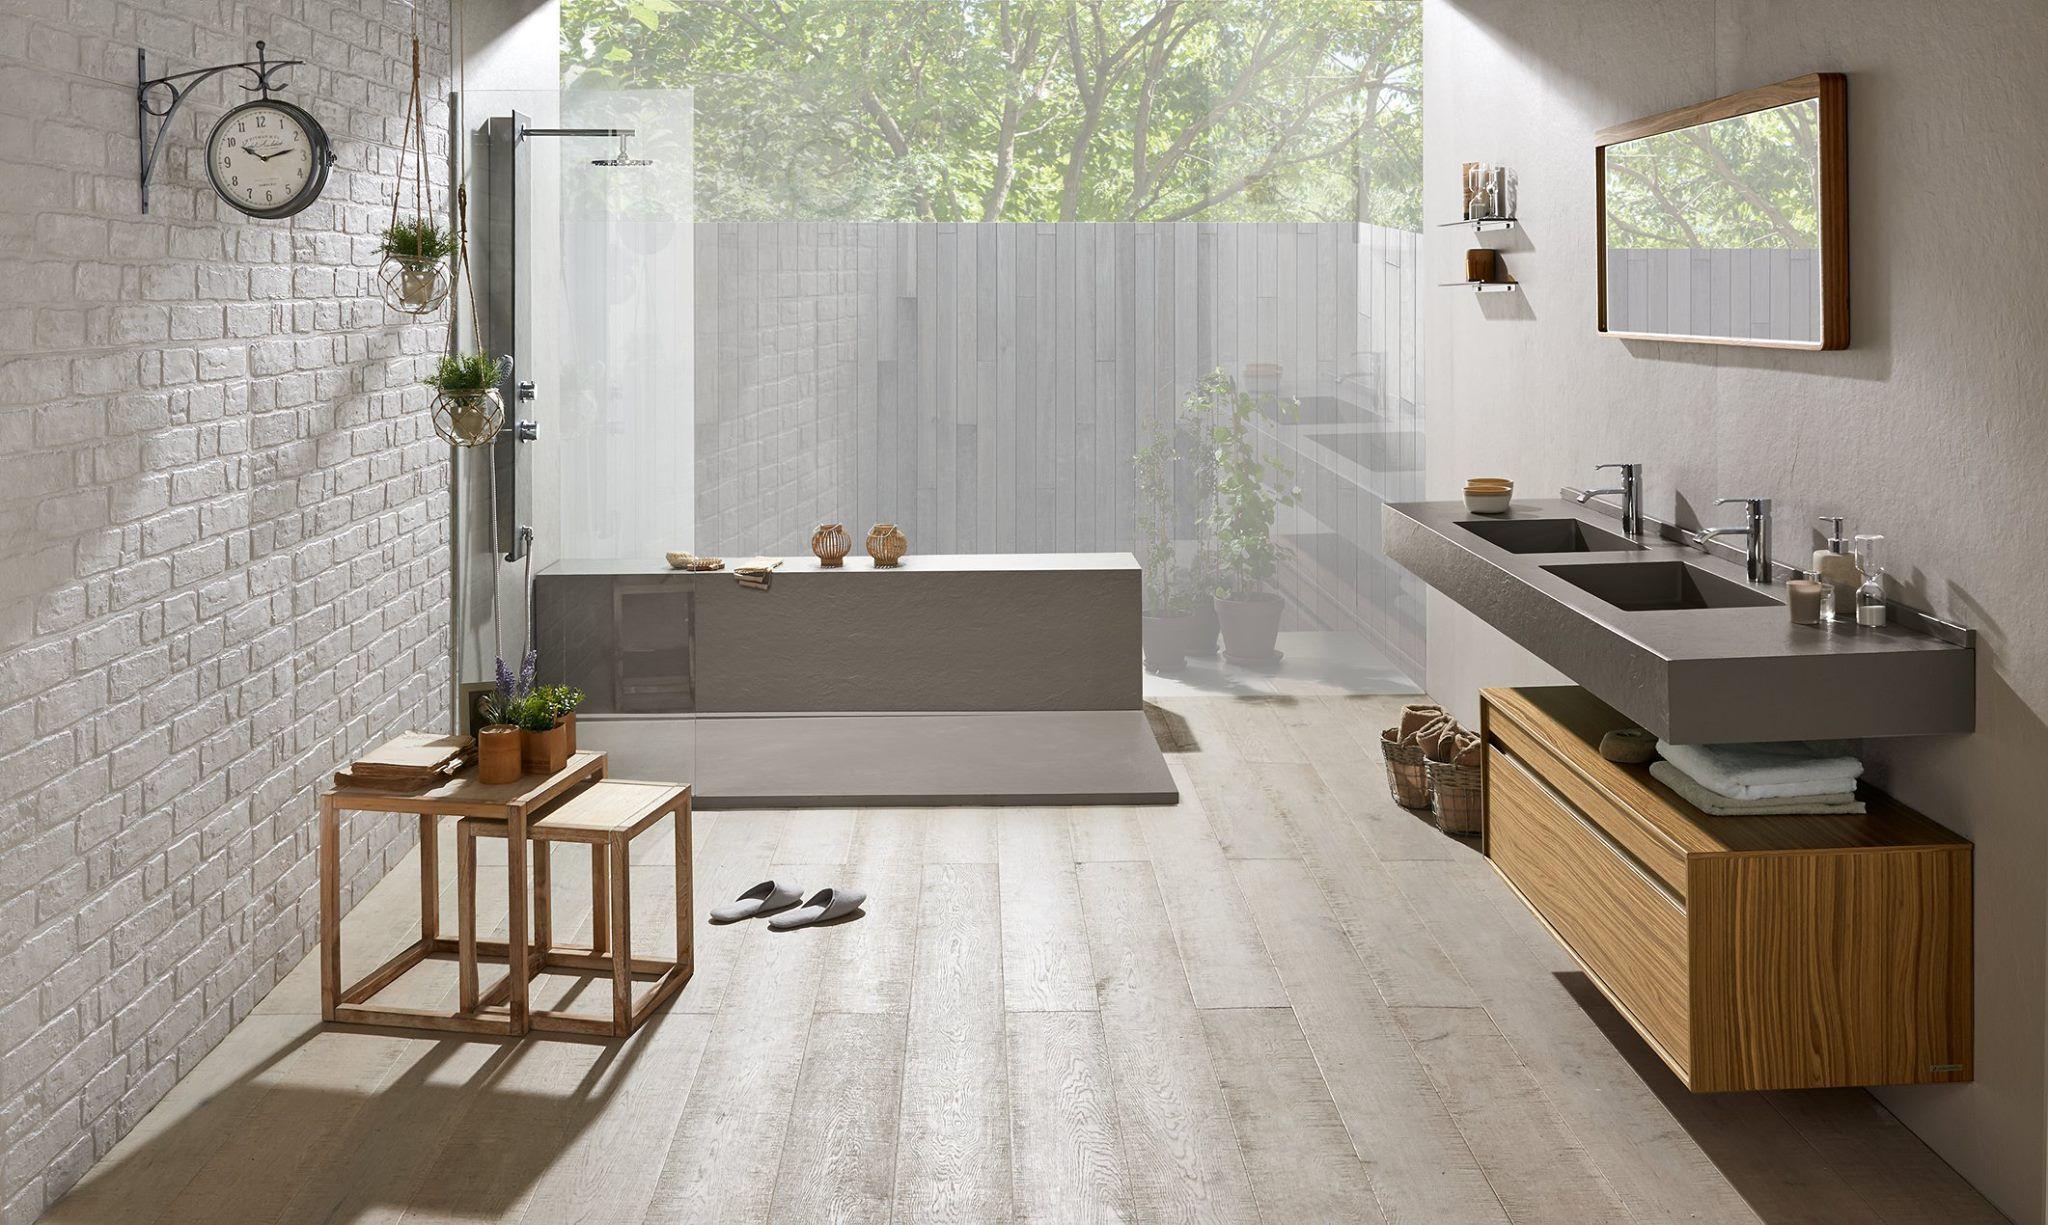 Plato De Ducha Acquabella.Pin Auf Modernes Baddesign Modern Bathroom Design